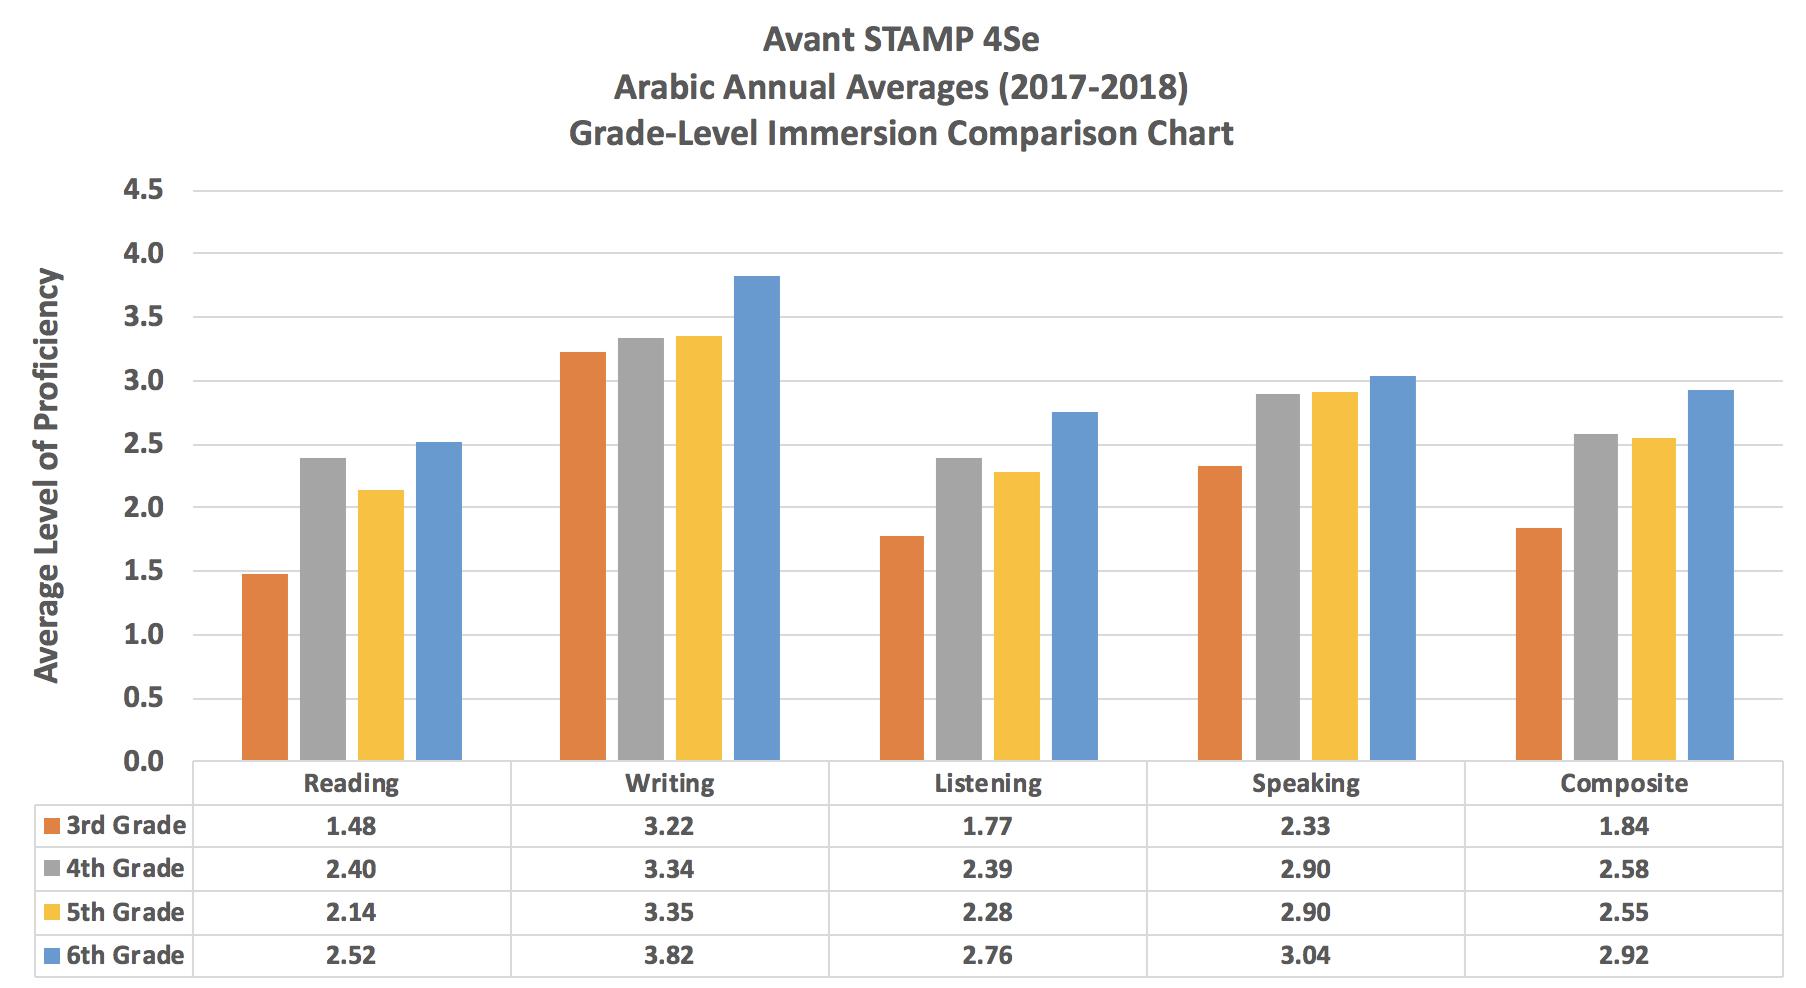 4Se_Arabic_AcadYear2017-2018.jpg